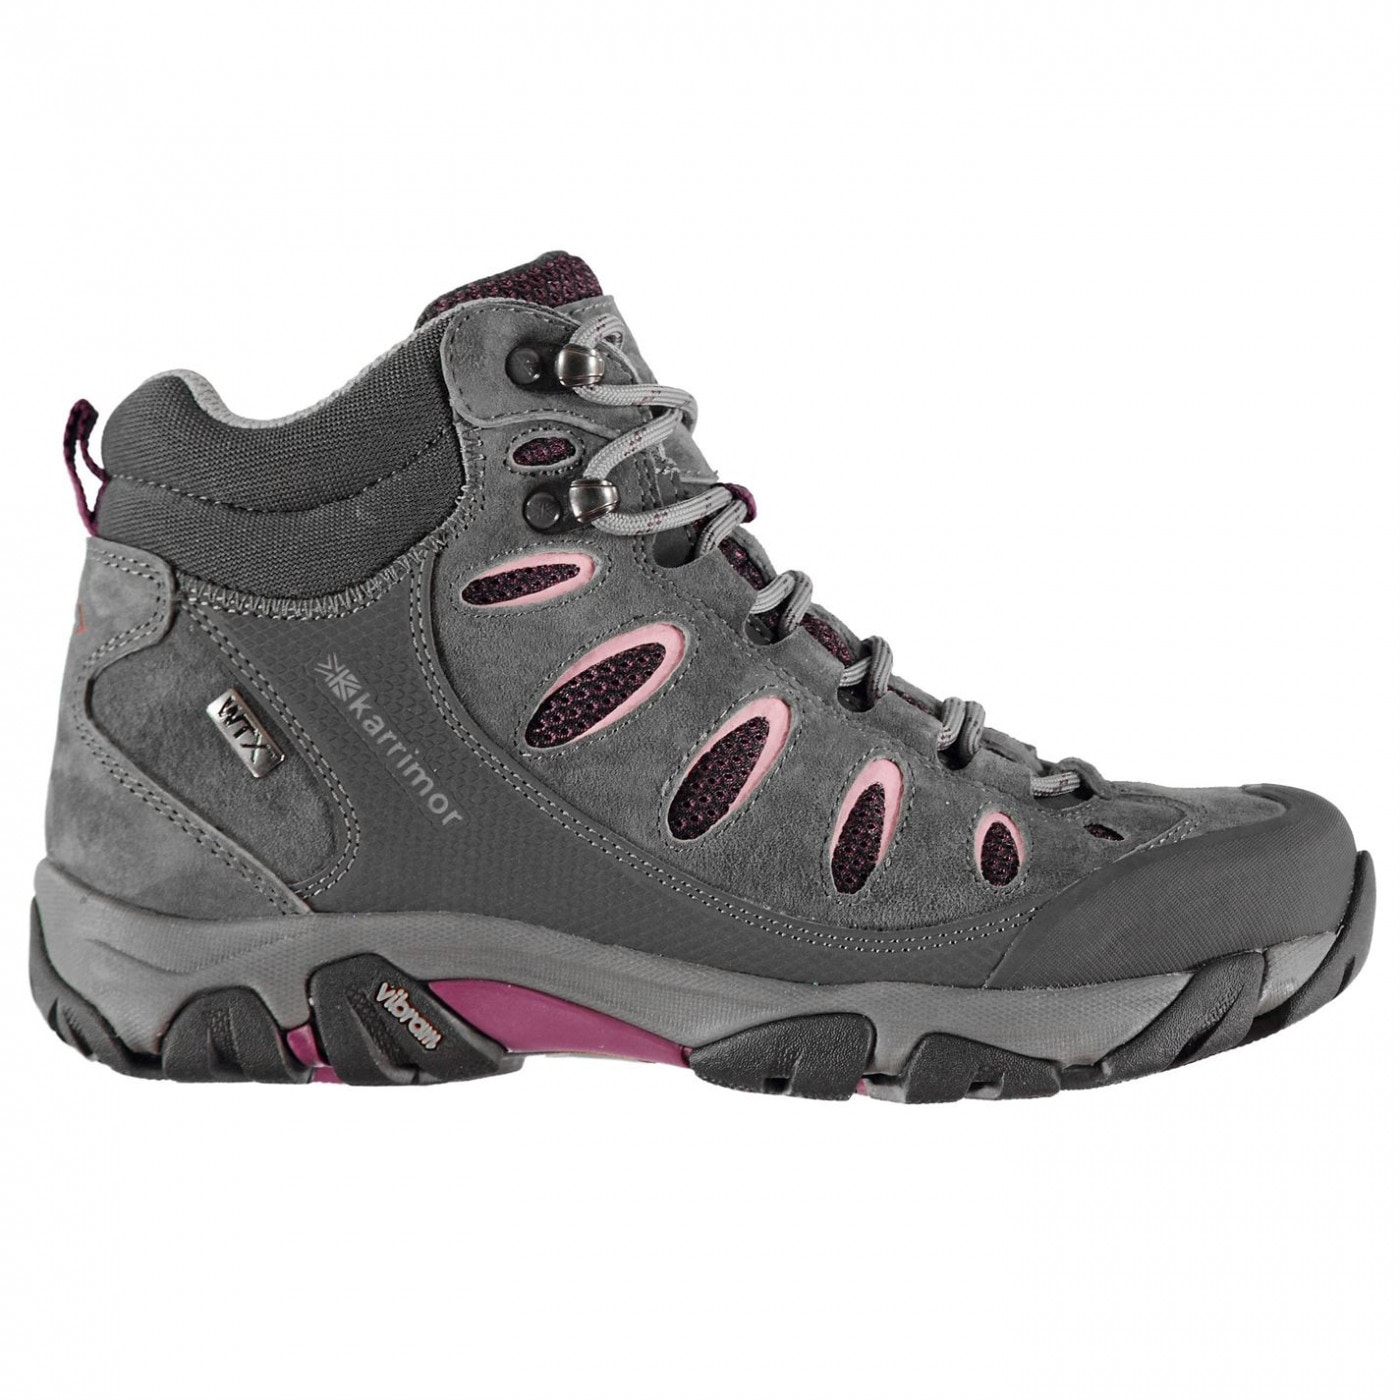 Karrimor Corrie Ladies Walking Boots